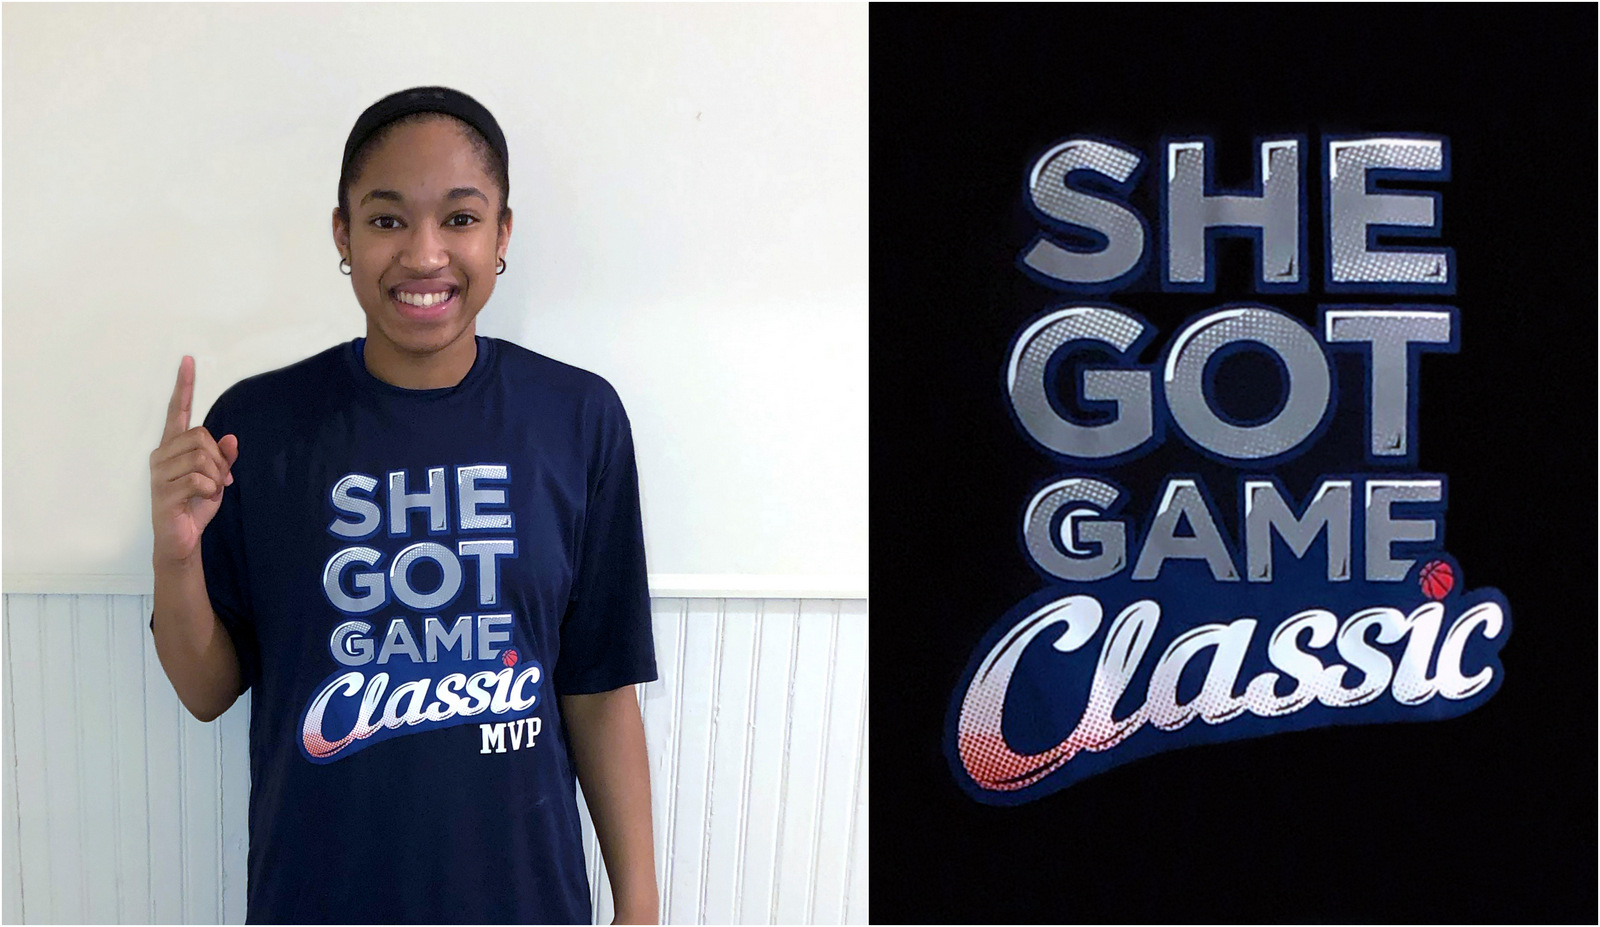 MVP: She Got Game Classic